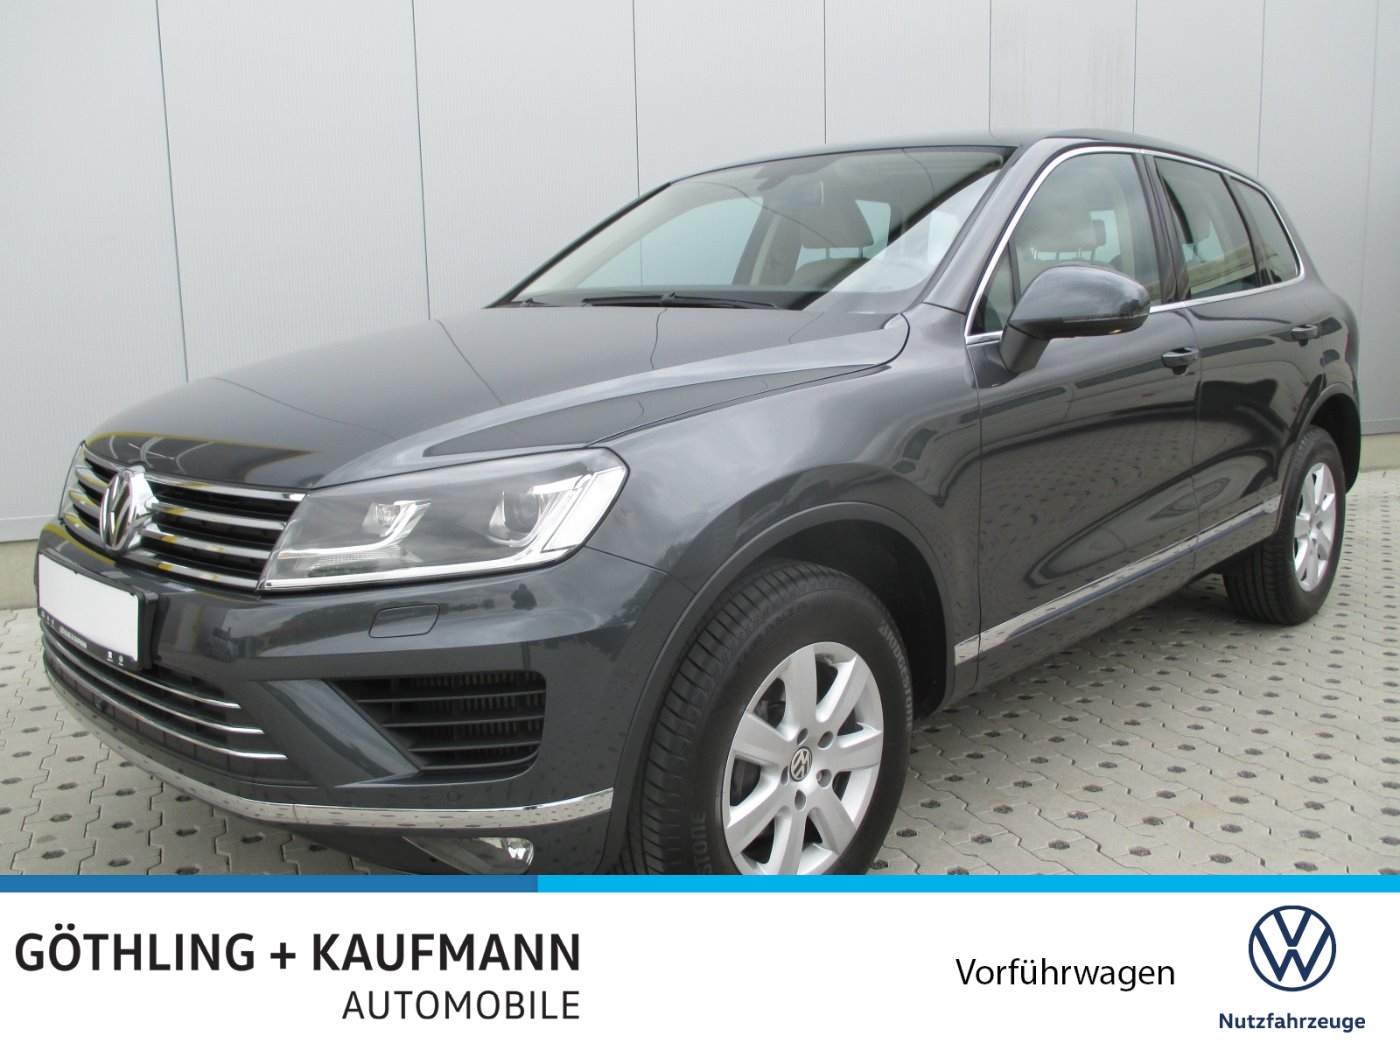 Volkswagen Touareg 3.0 TDI V6 SCR tiptro. 150kW*Kamera*Xeno, Jahr 2015, Diesel